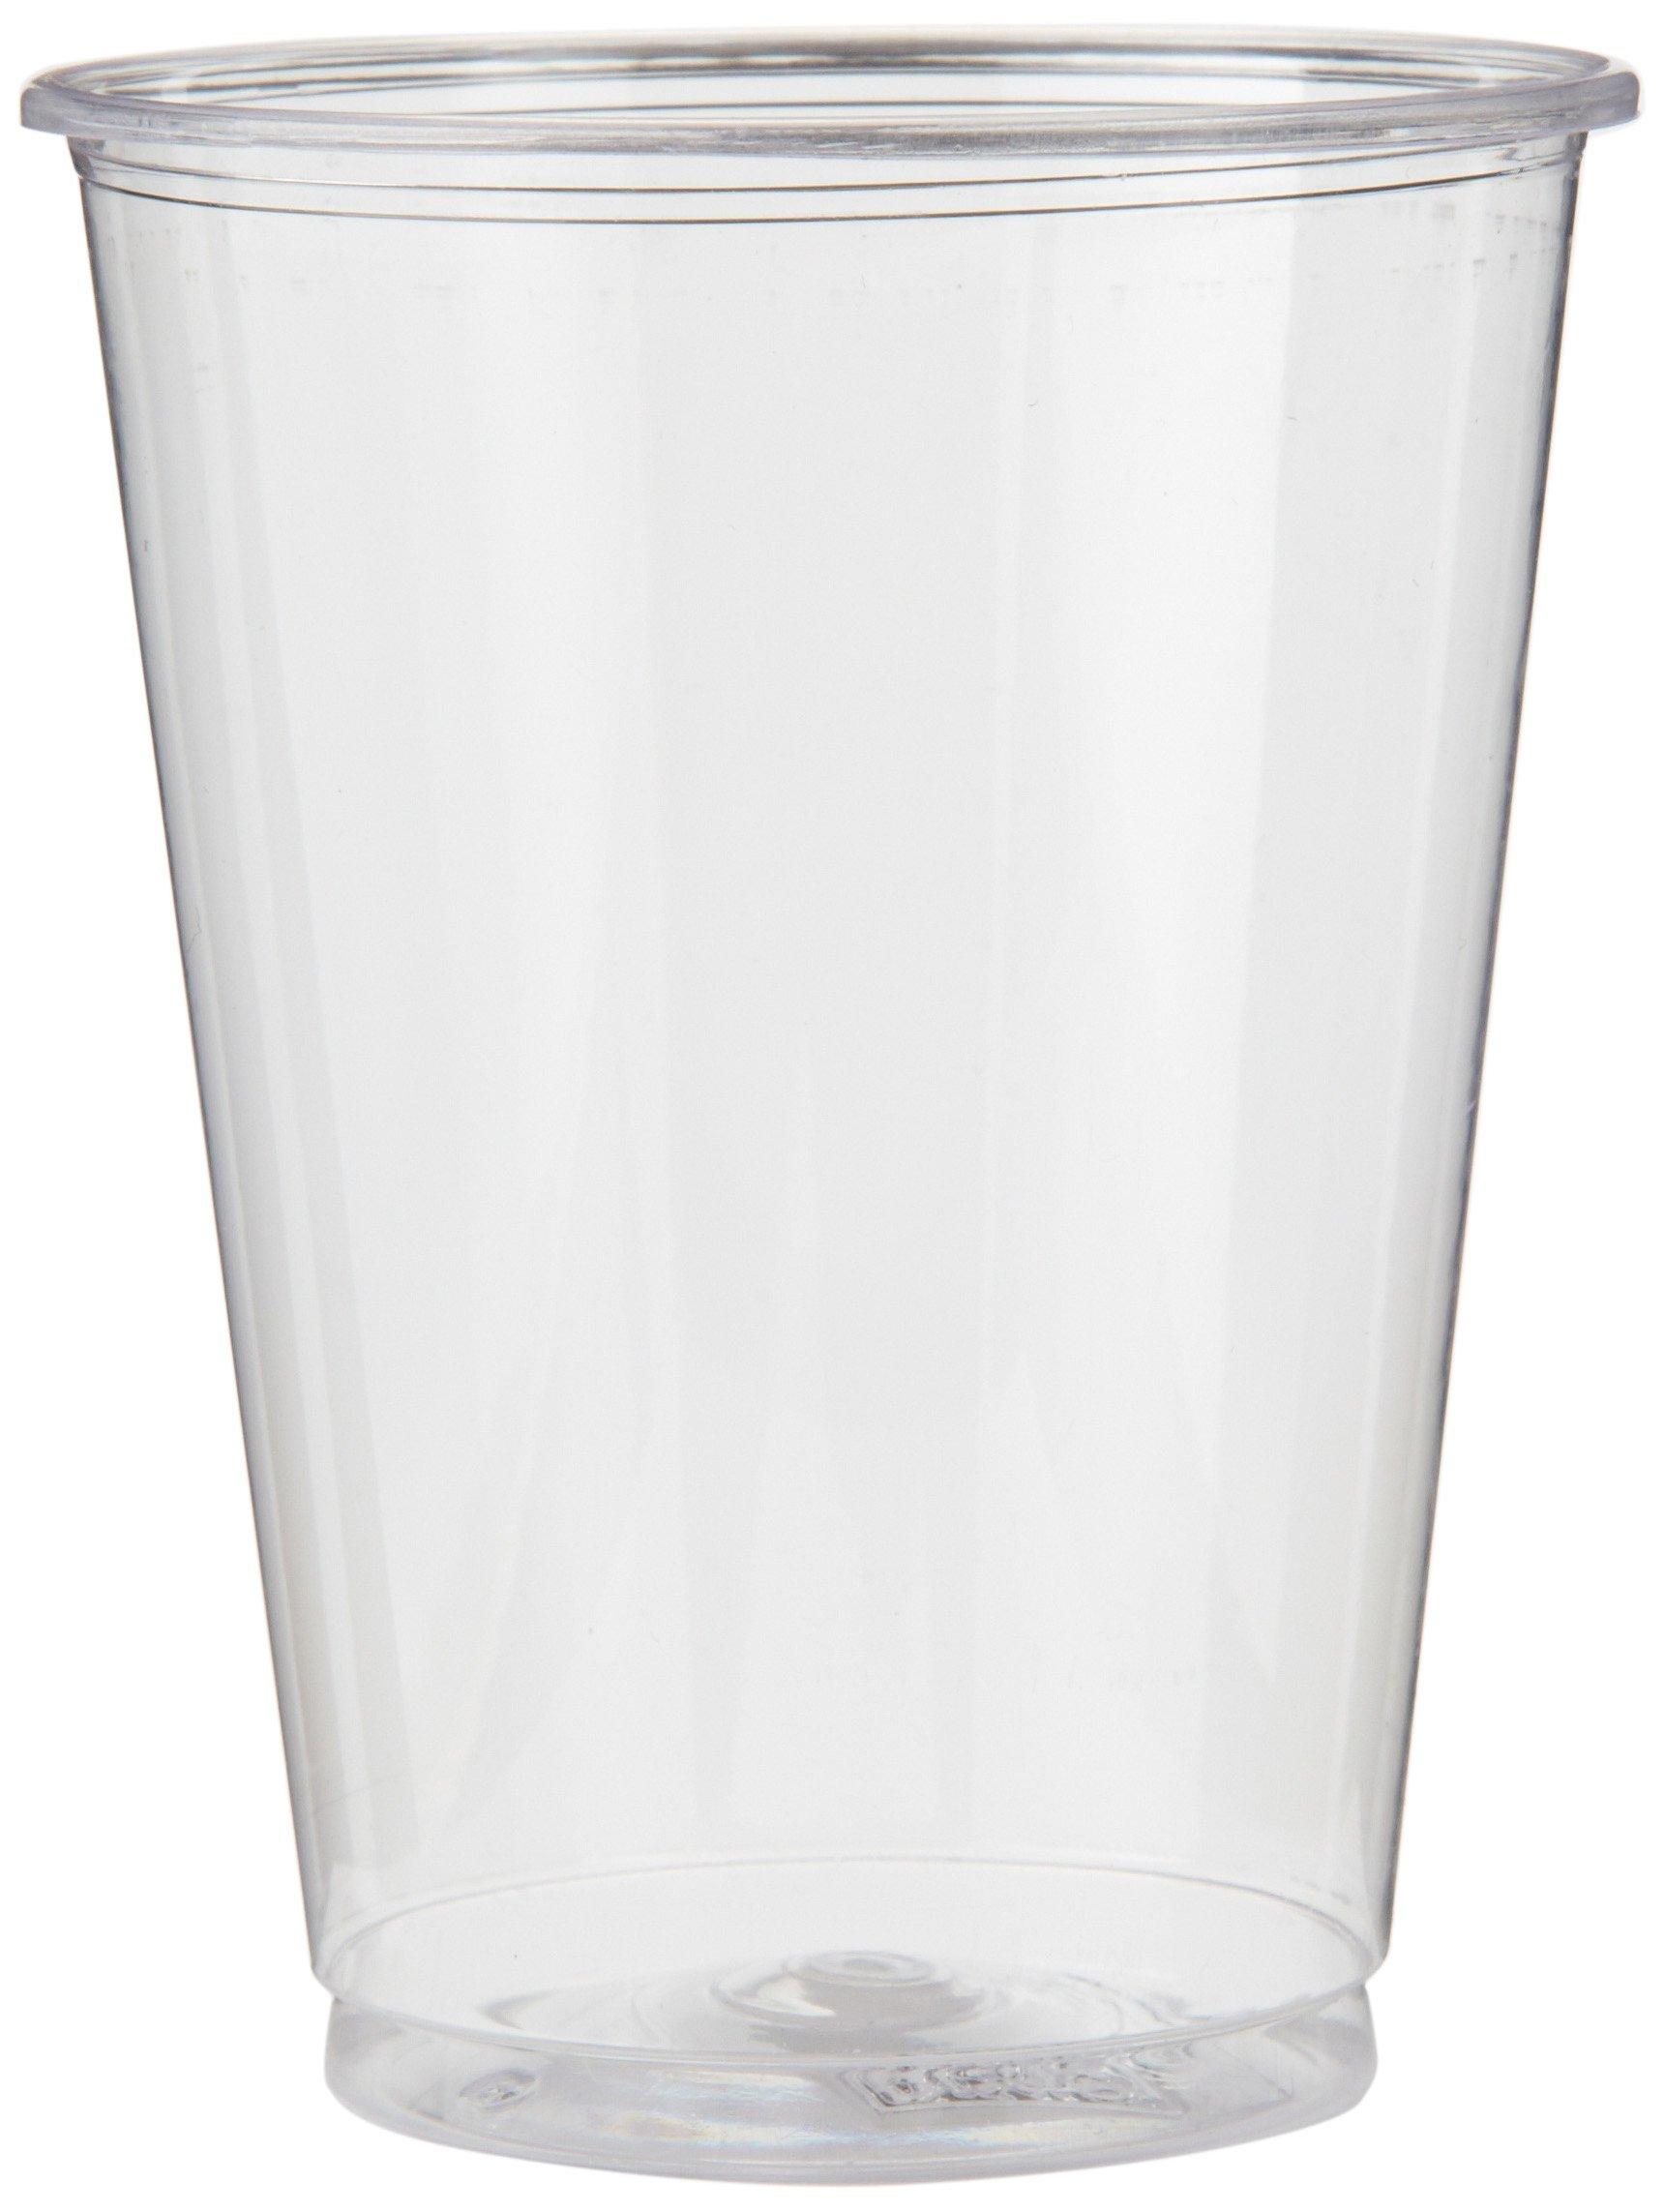 plastic cup edited - photo #33